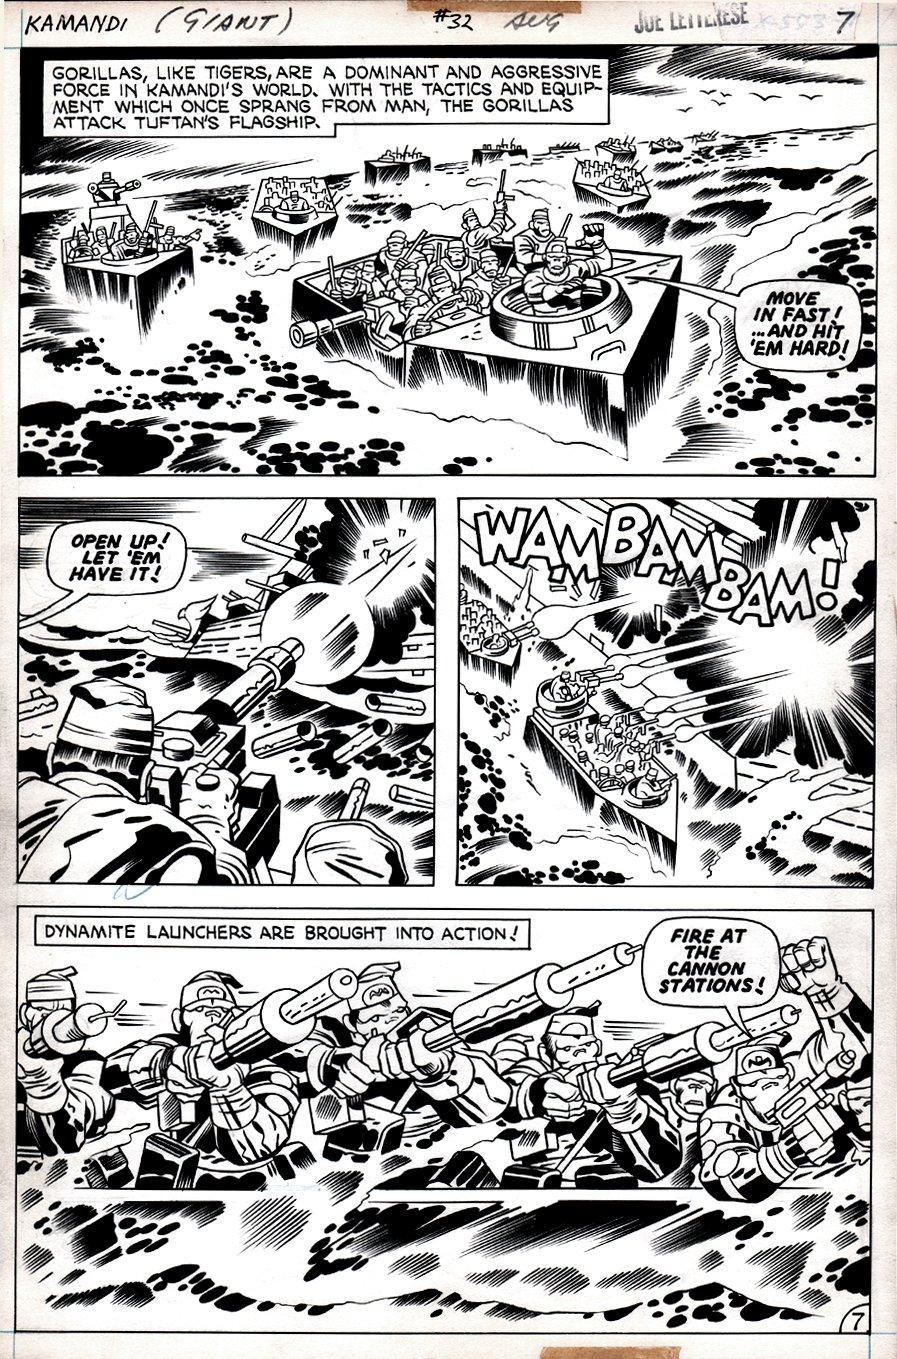 Kamandi #32 p 7 (Tiger Men Battle The Gorilla Commandos!) 1975